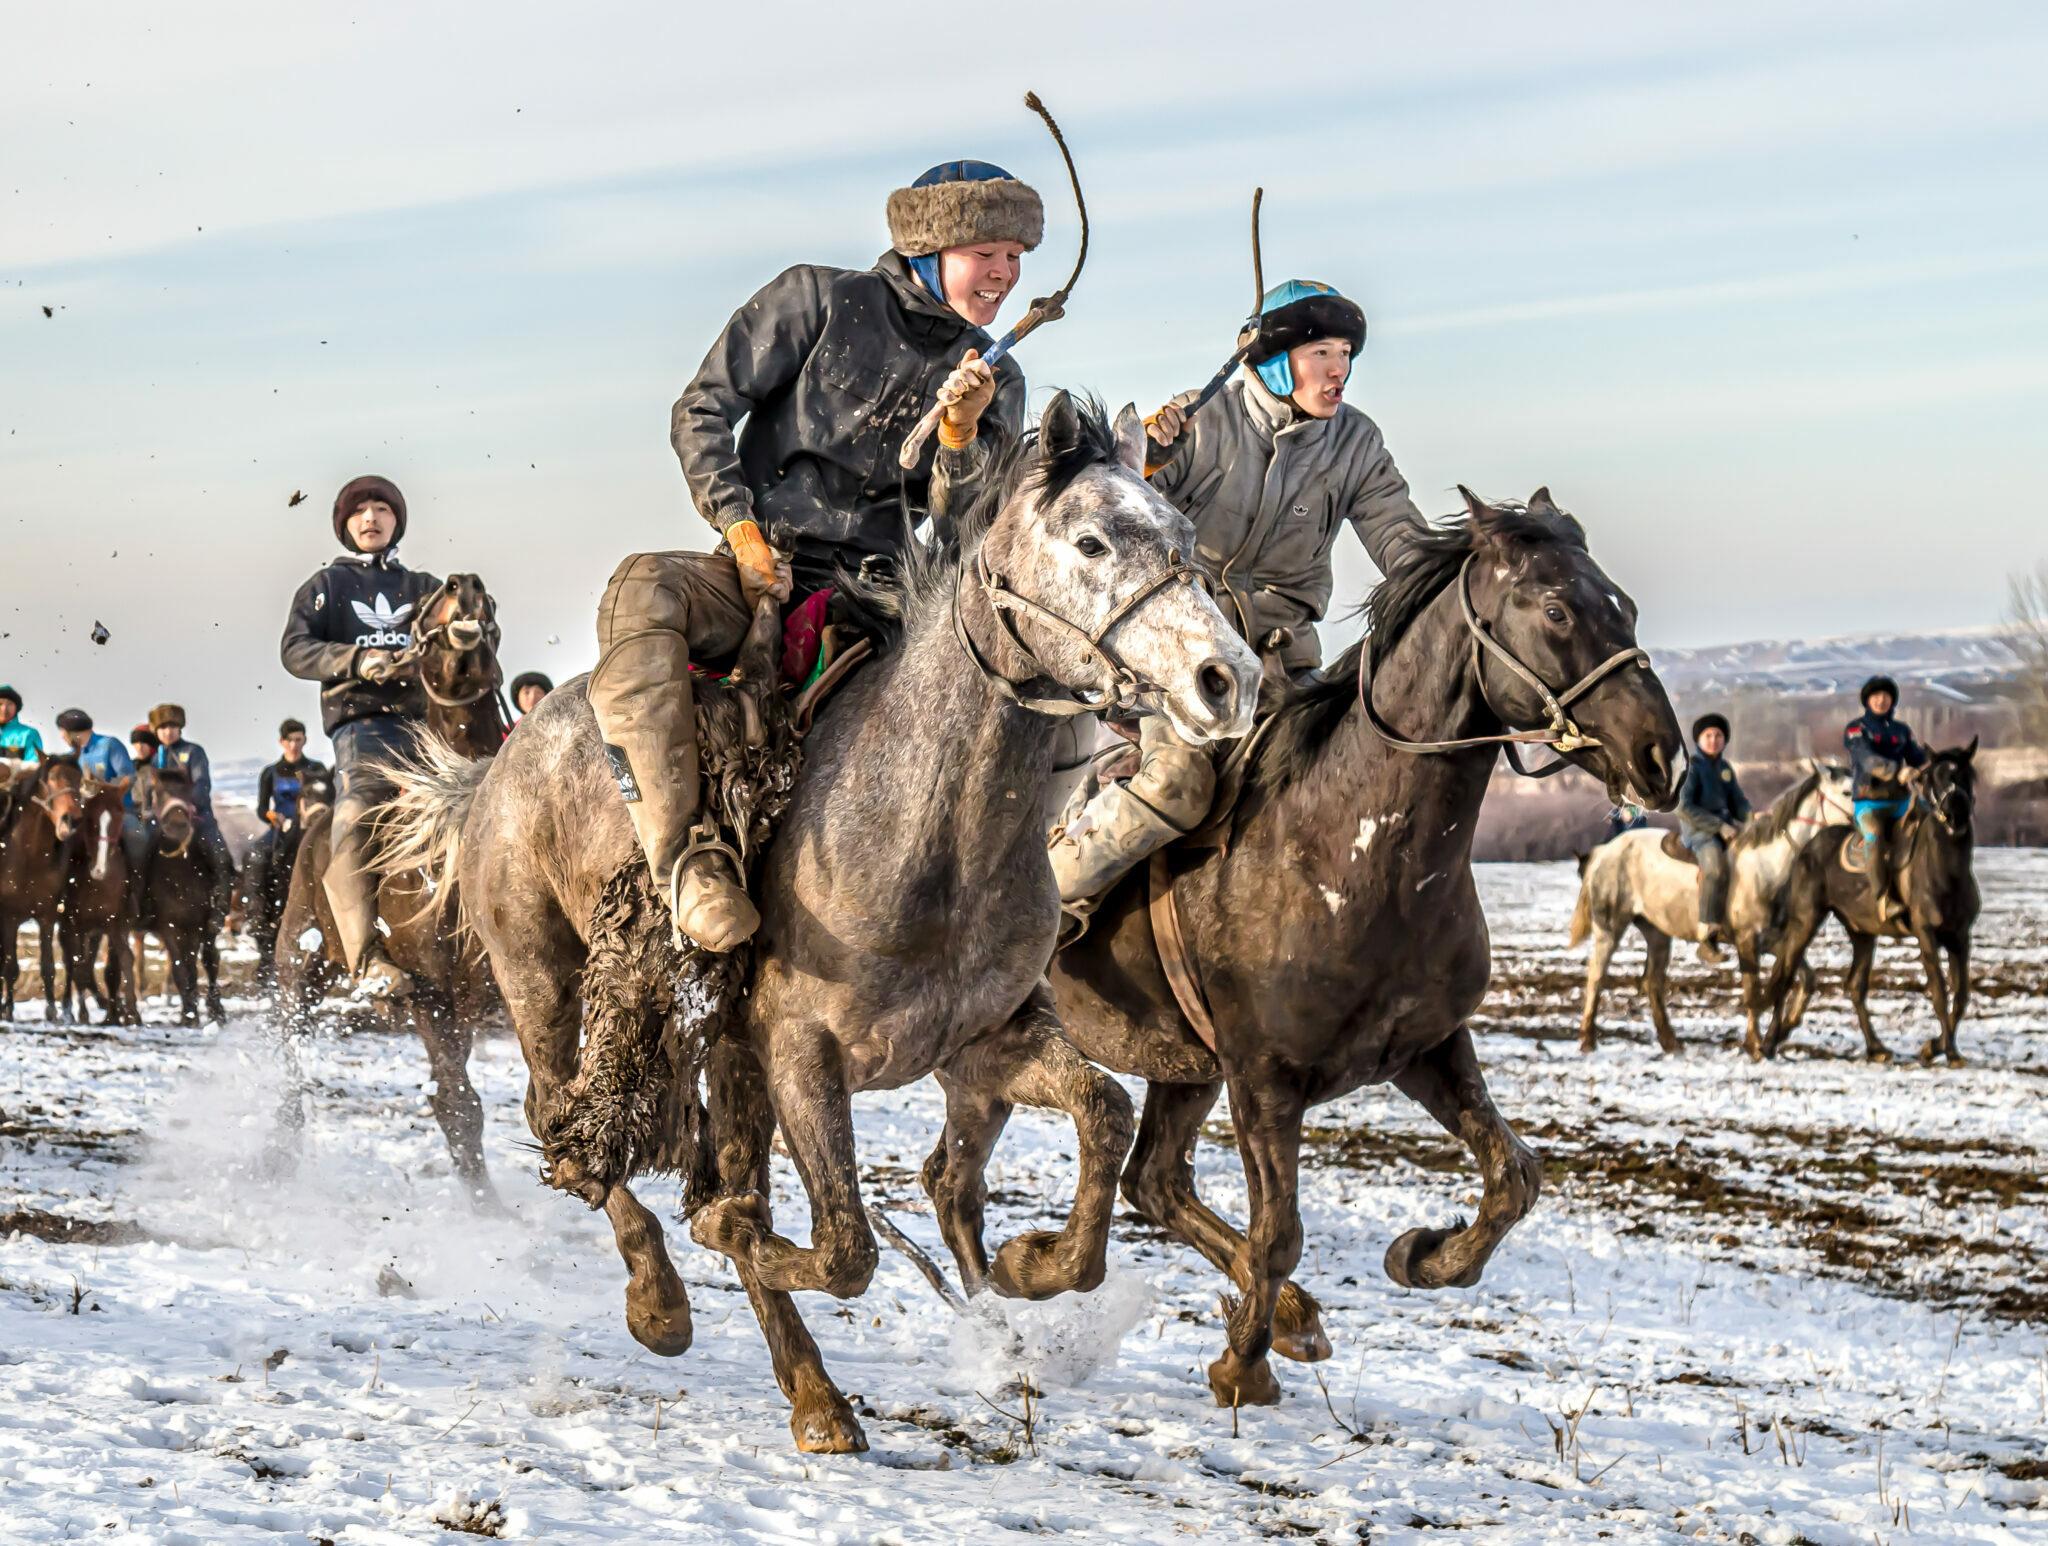 Horse Breed: Kazakh - image by Vladimir Konstantinov/Shutterstock.com - Globetrotting horse riding holidays